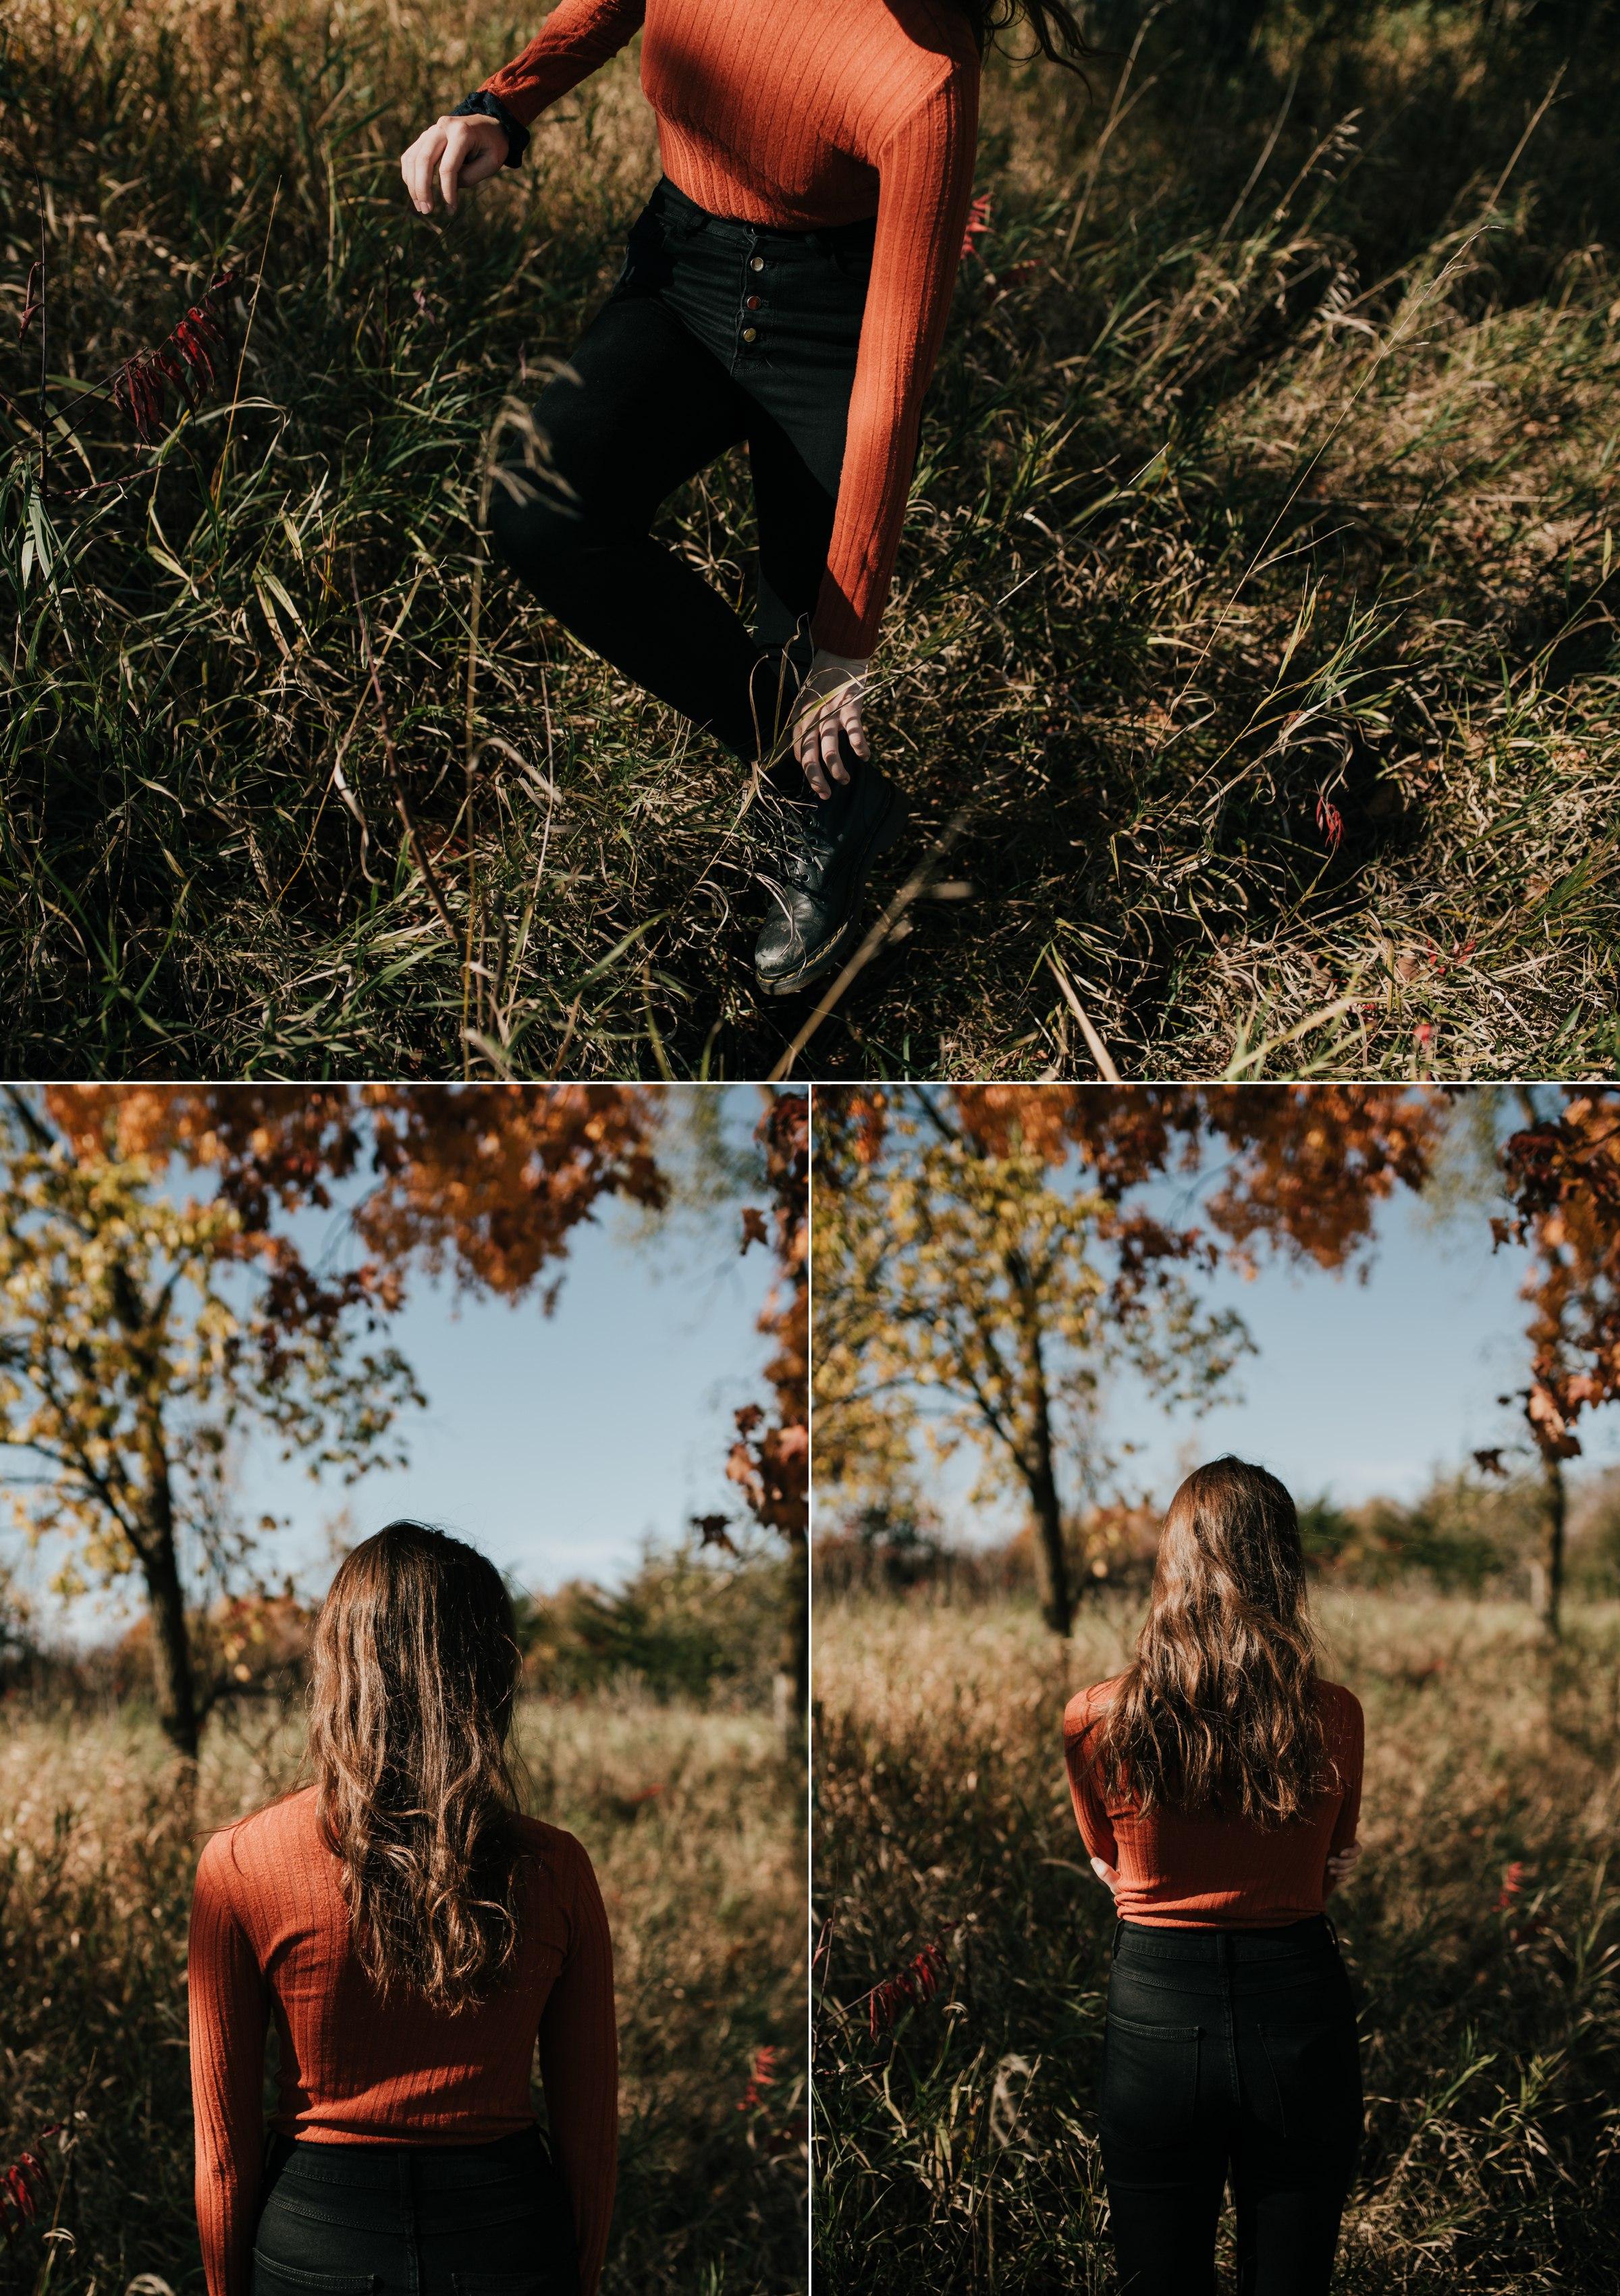 jules portrait engagement minneapolis minnesota texas austin wedding elopement destination intimate best photographer_0017.jpg